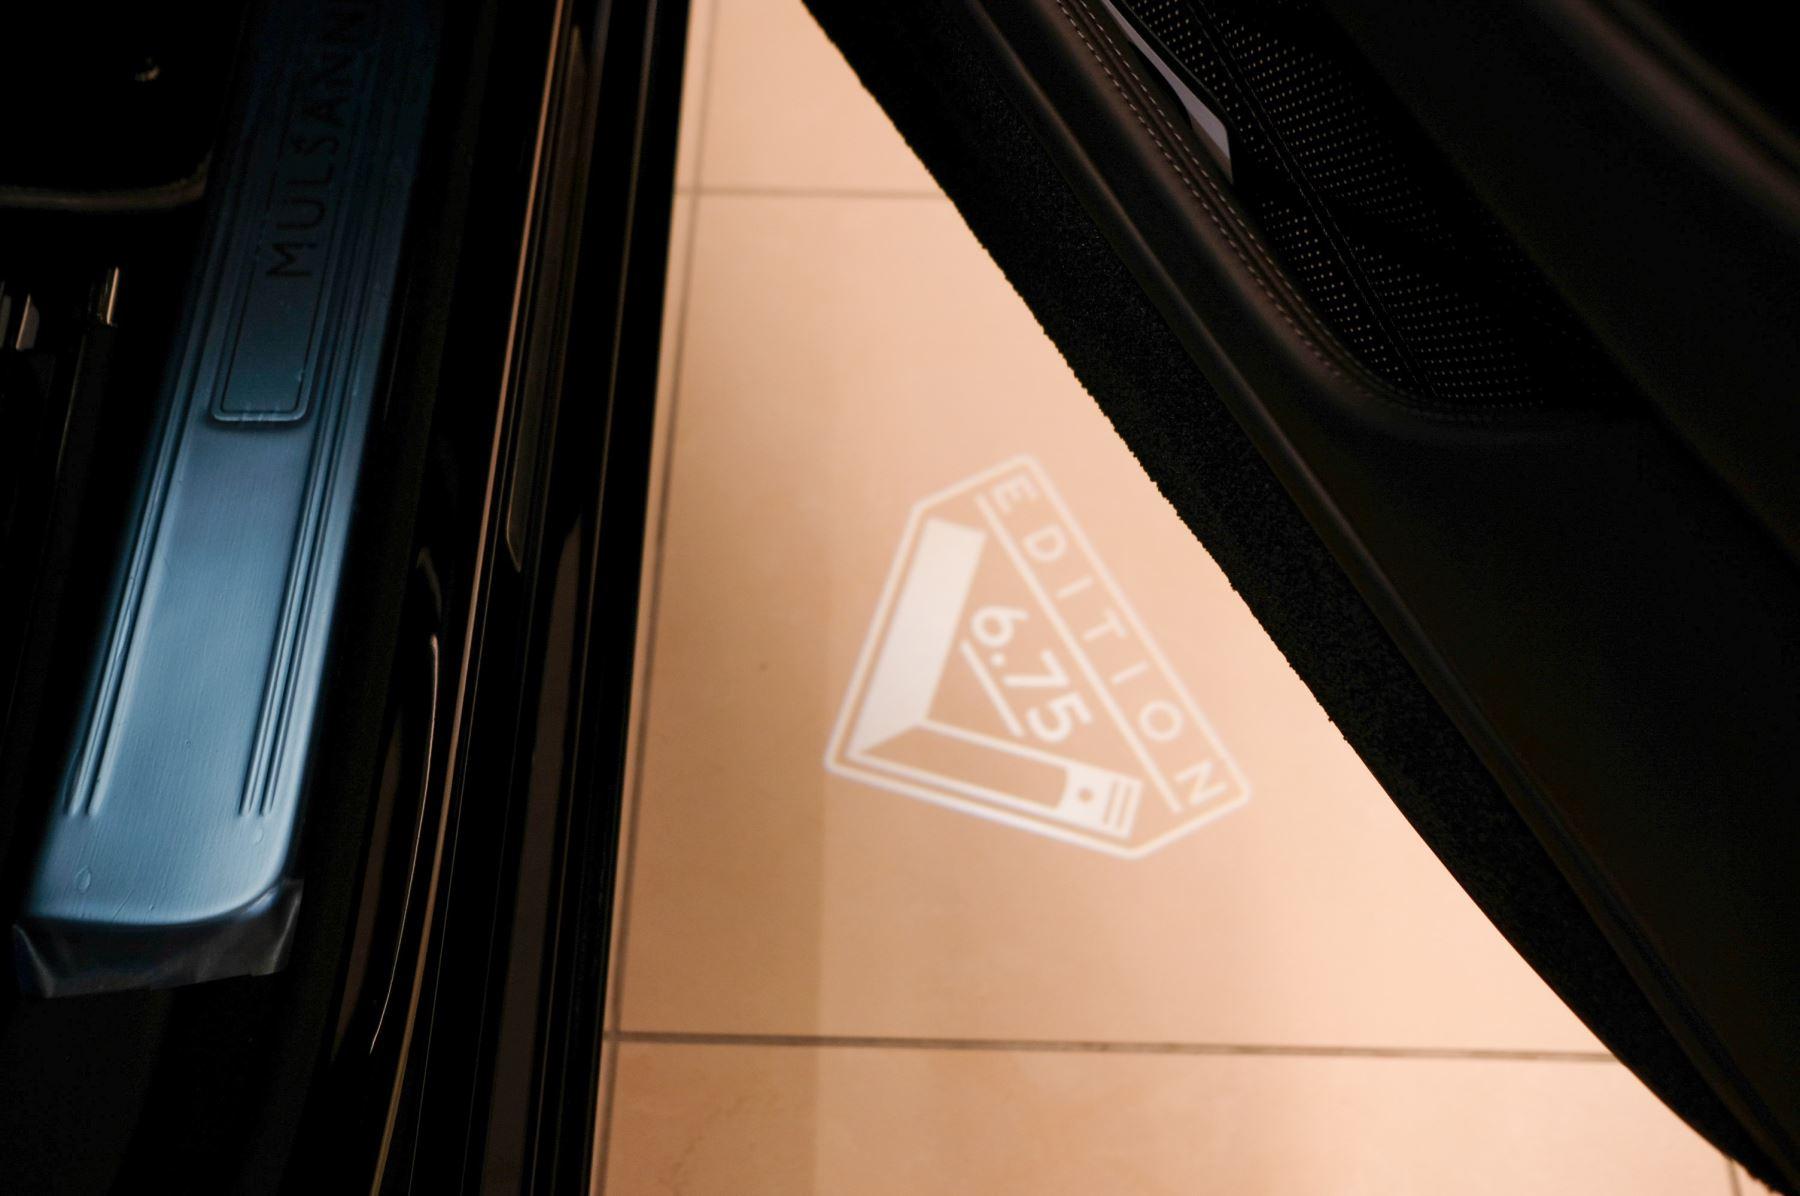 Bentley Mulsanne Mulsanne 6.75 Edition by Mulliner image 17